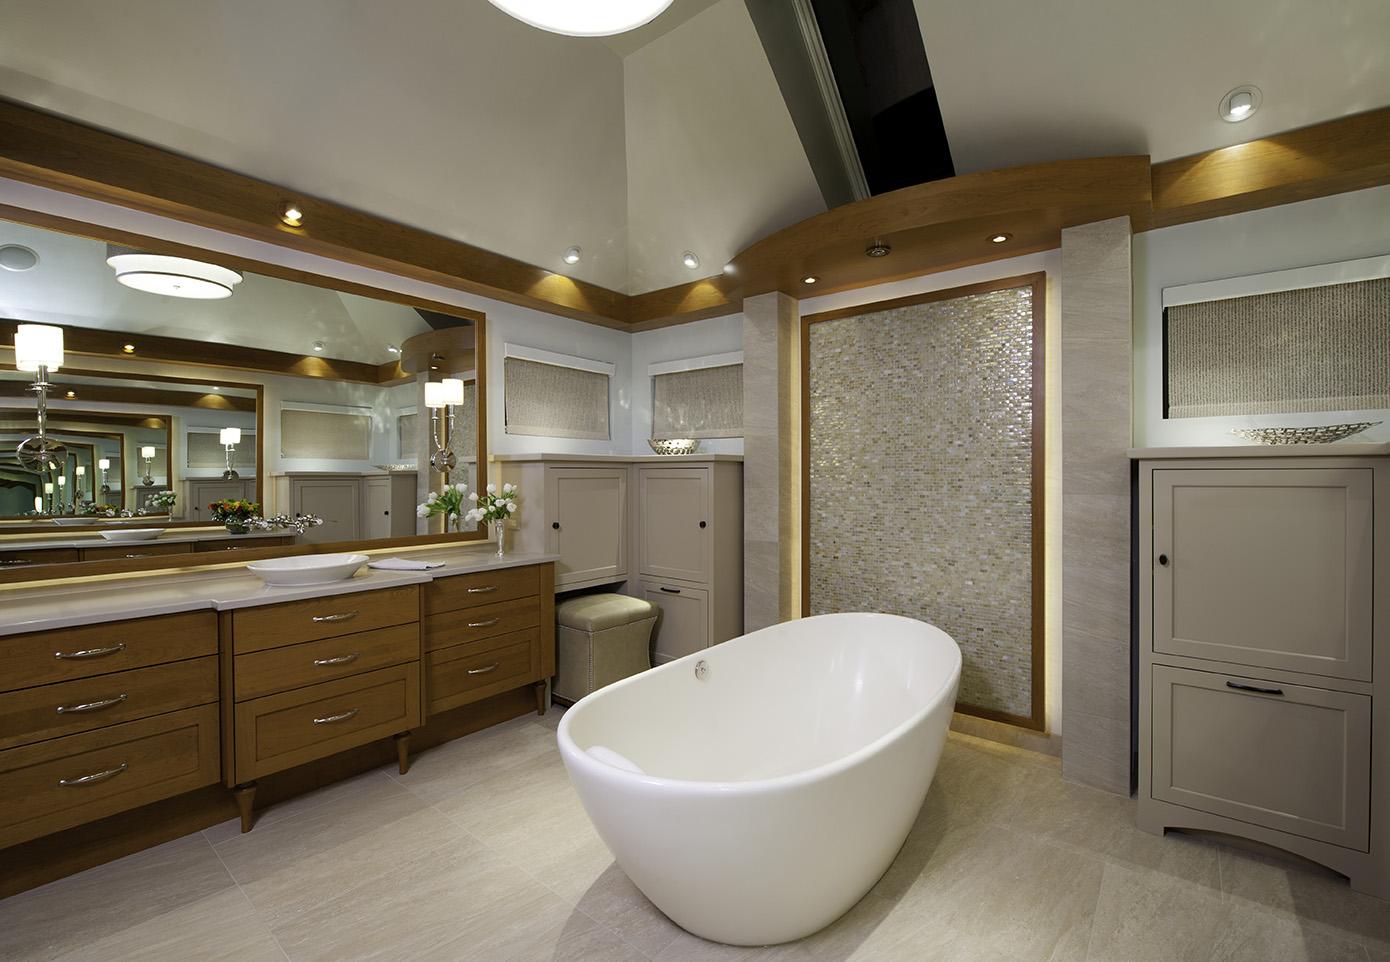 kitchen_bath_concepts_wholehome6_1.jpg